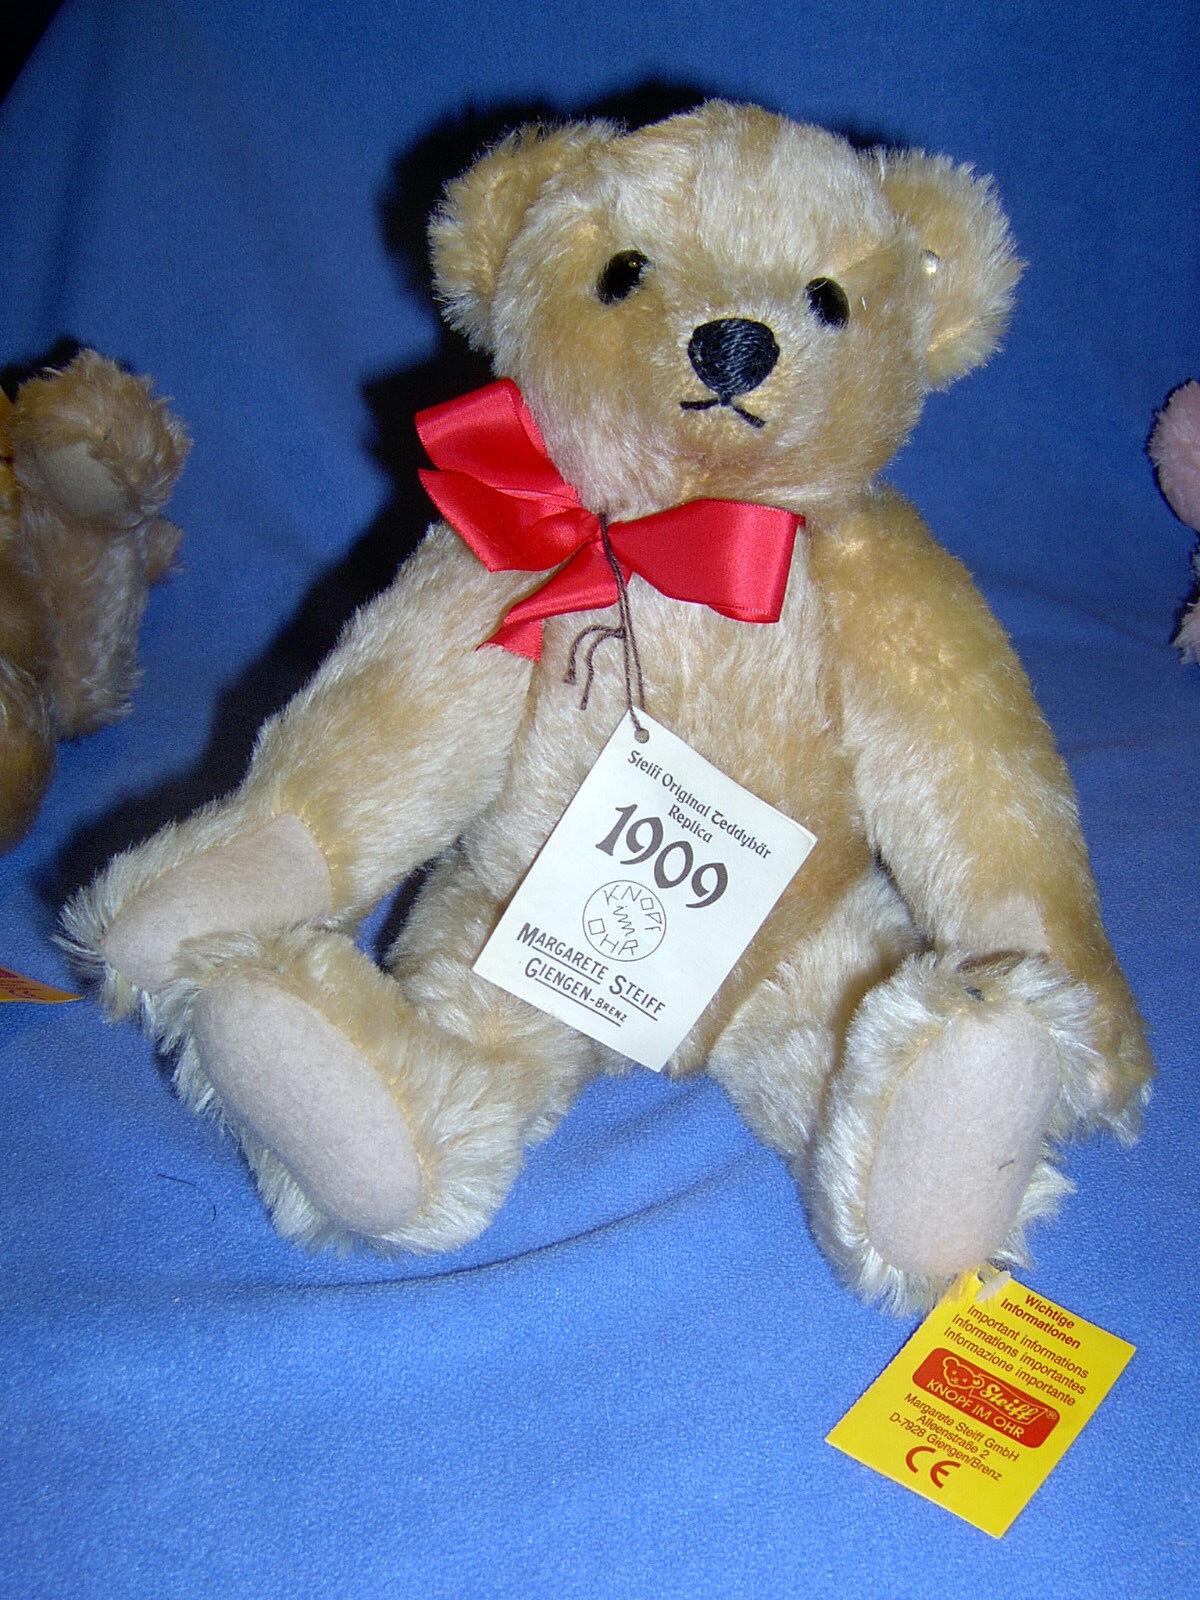 Steiff Teddy 406225 Teddybär Replica 1909 mit Stimme